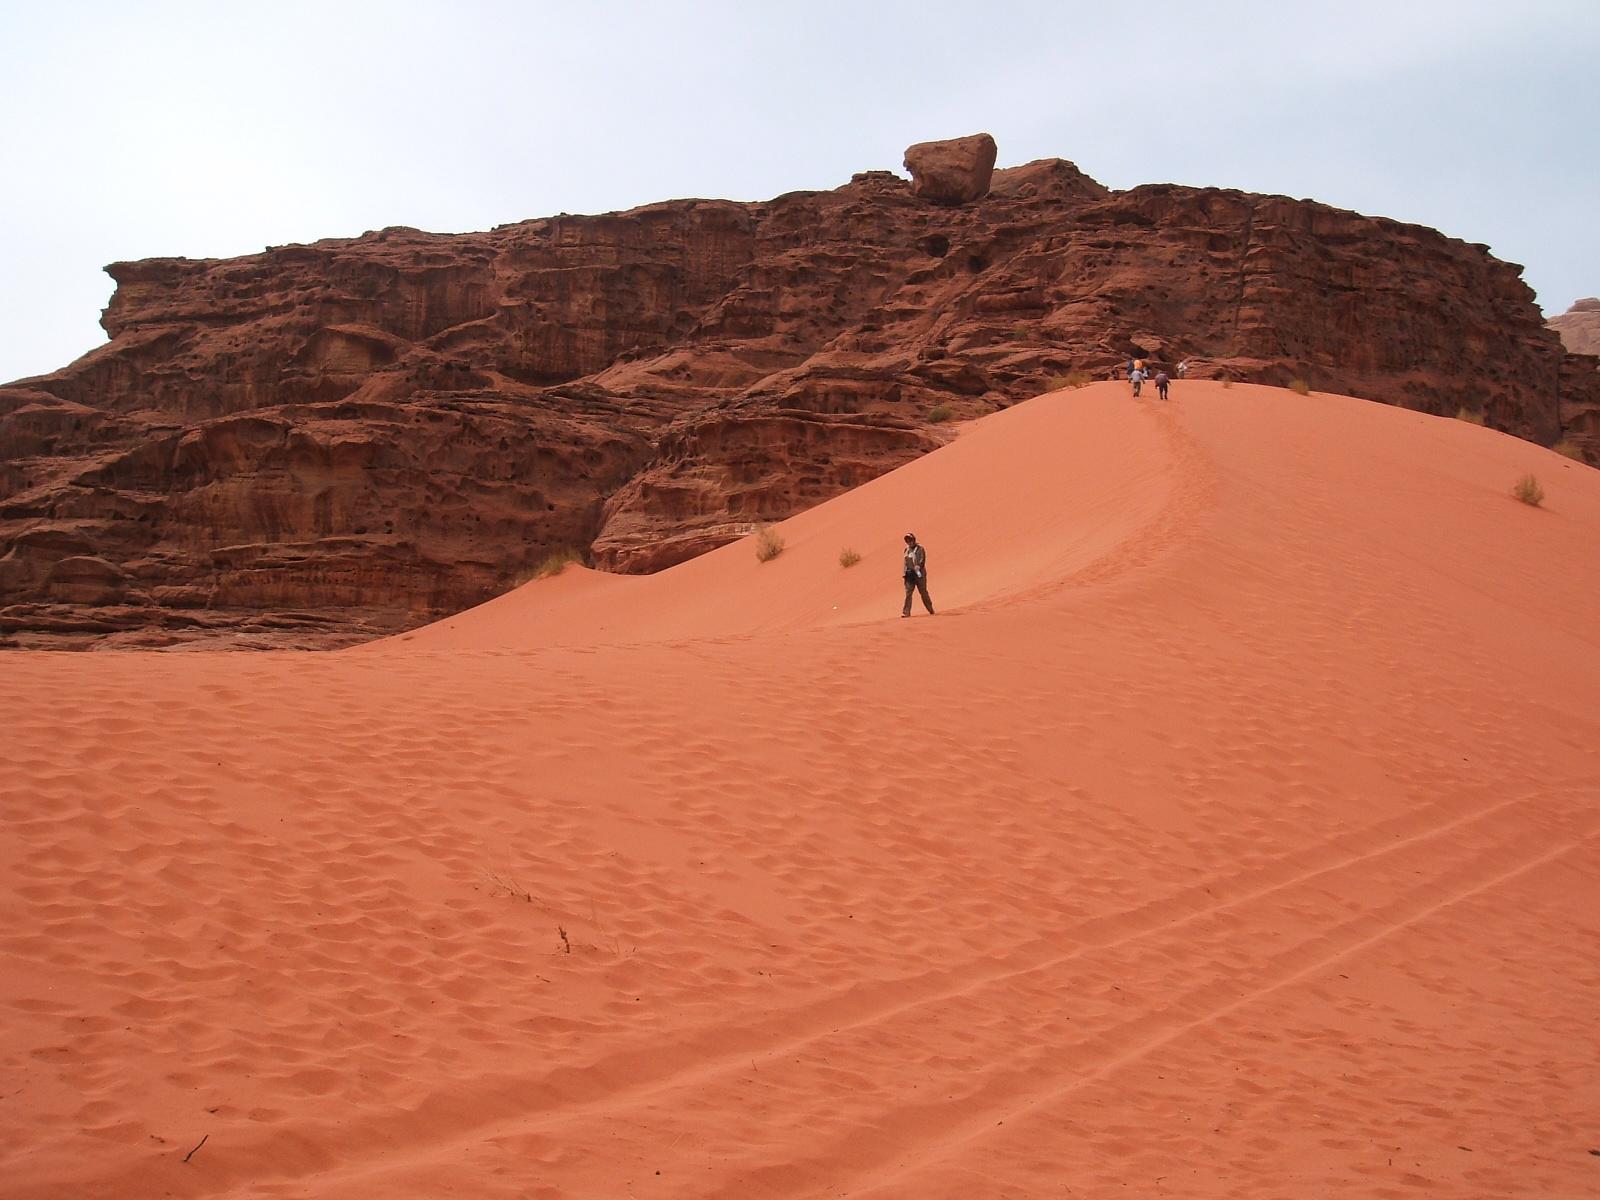 Wadi Rum Only half way up the sand dune